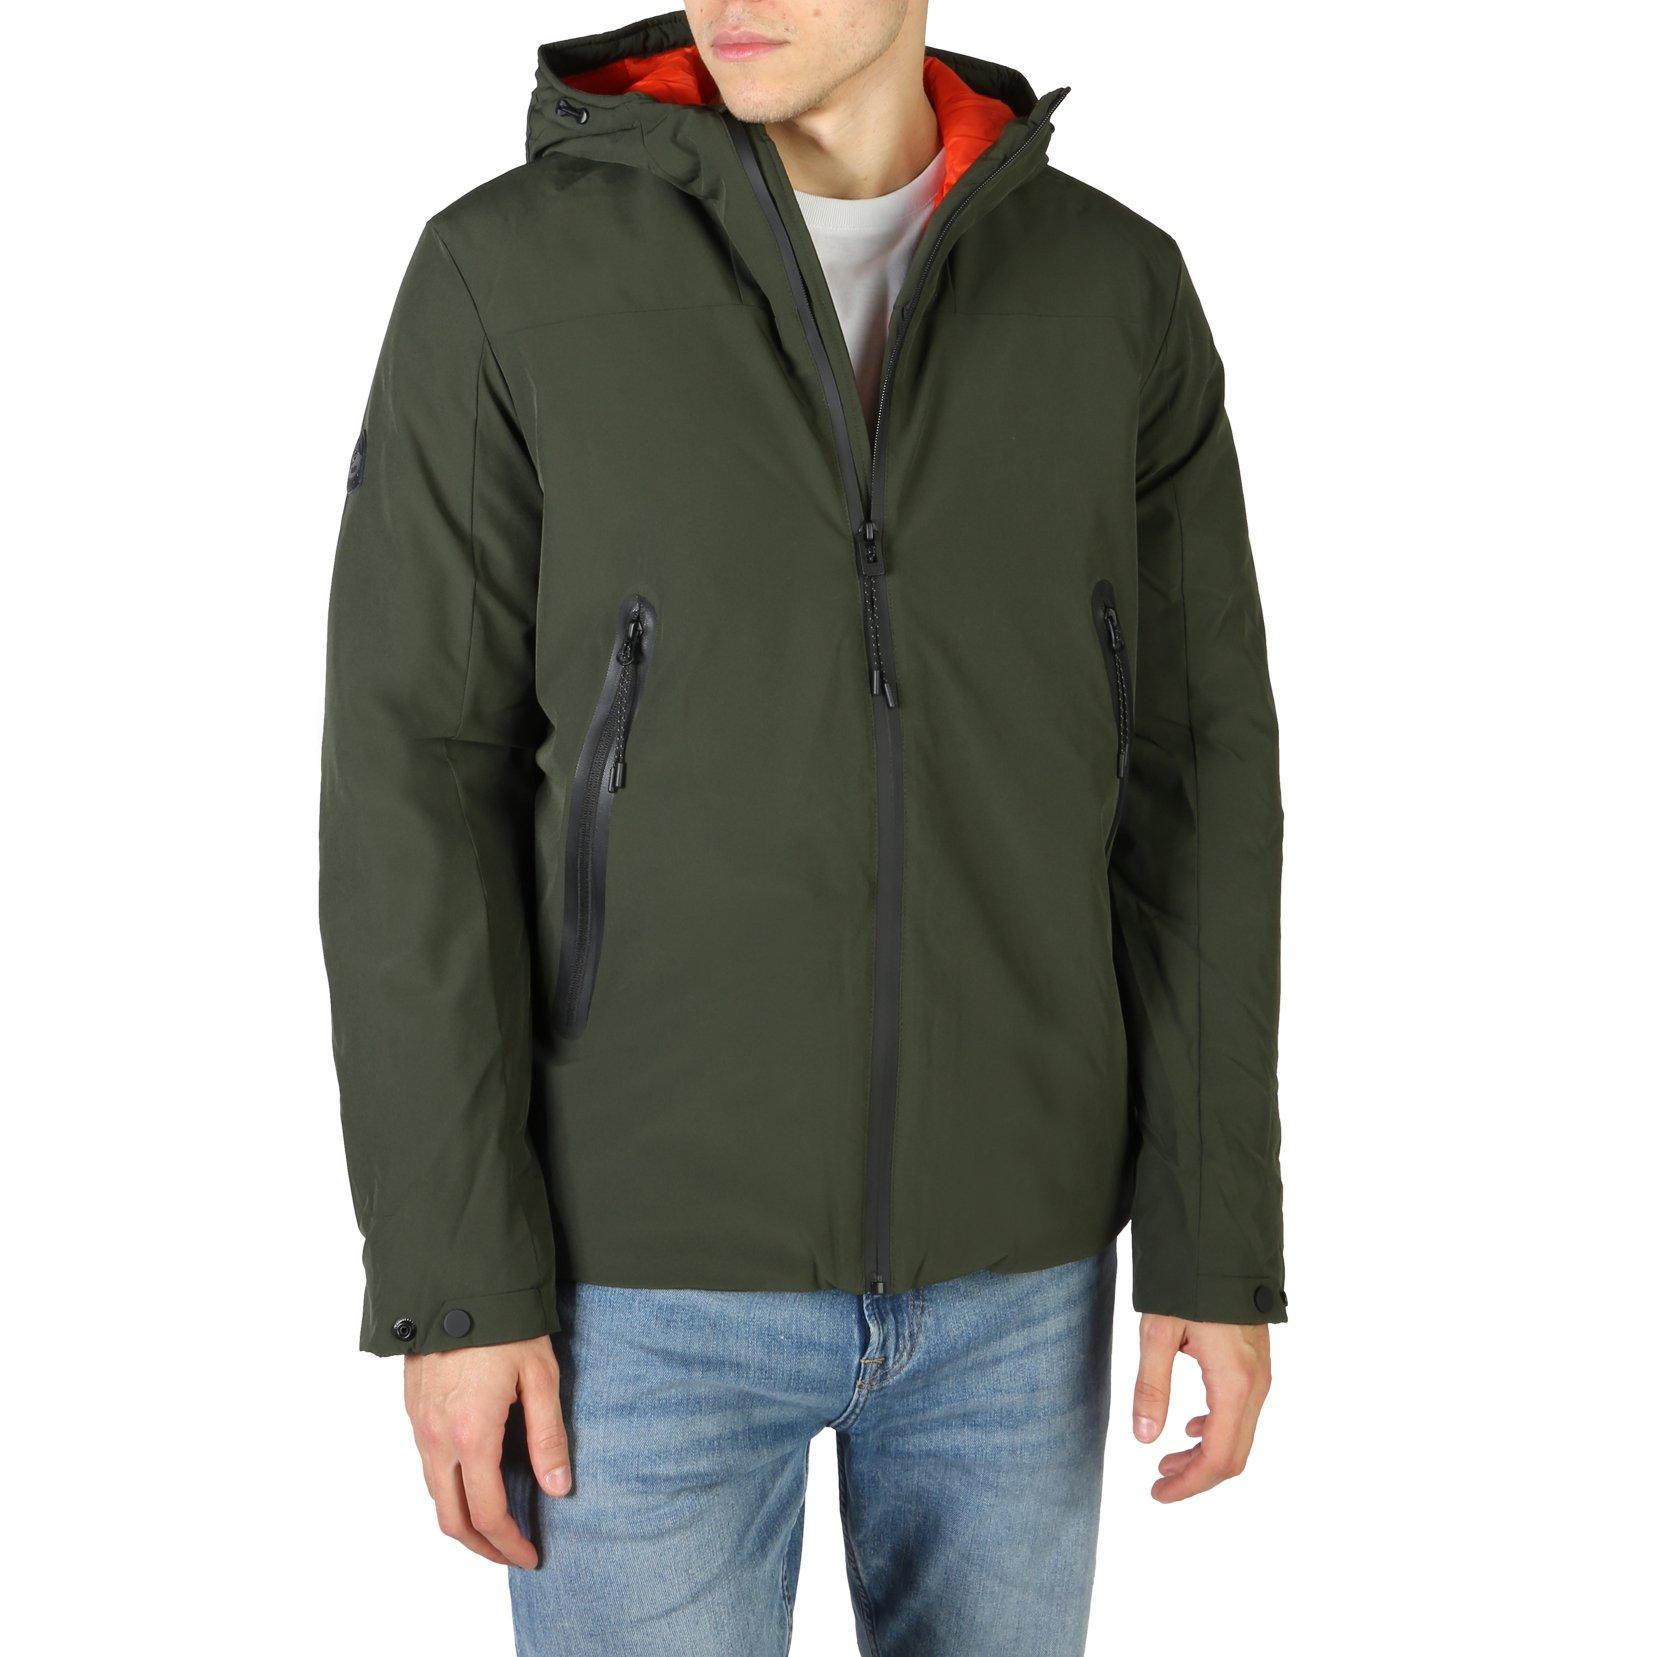 Superdry Men's Jacket Various Colours M5010317A - green S